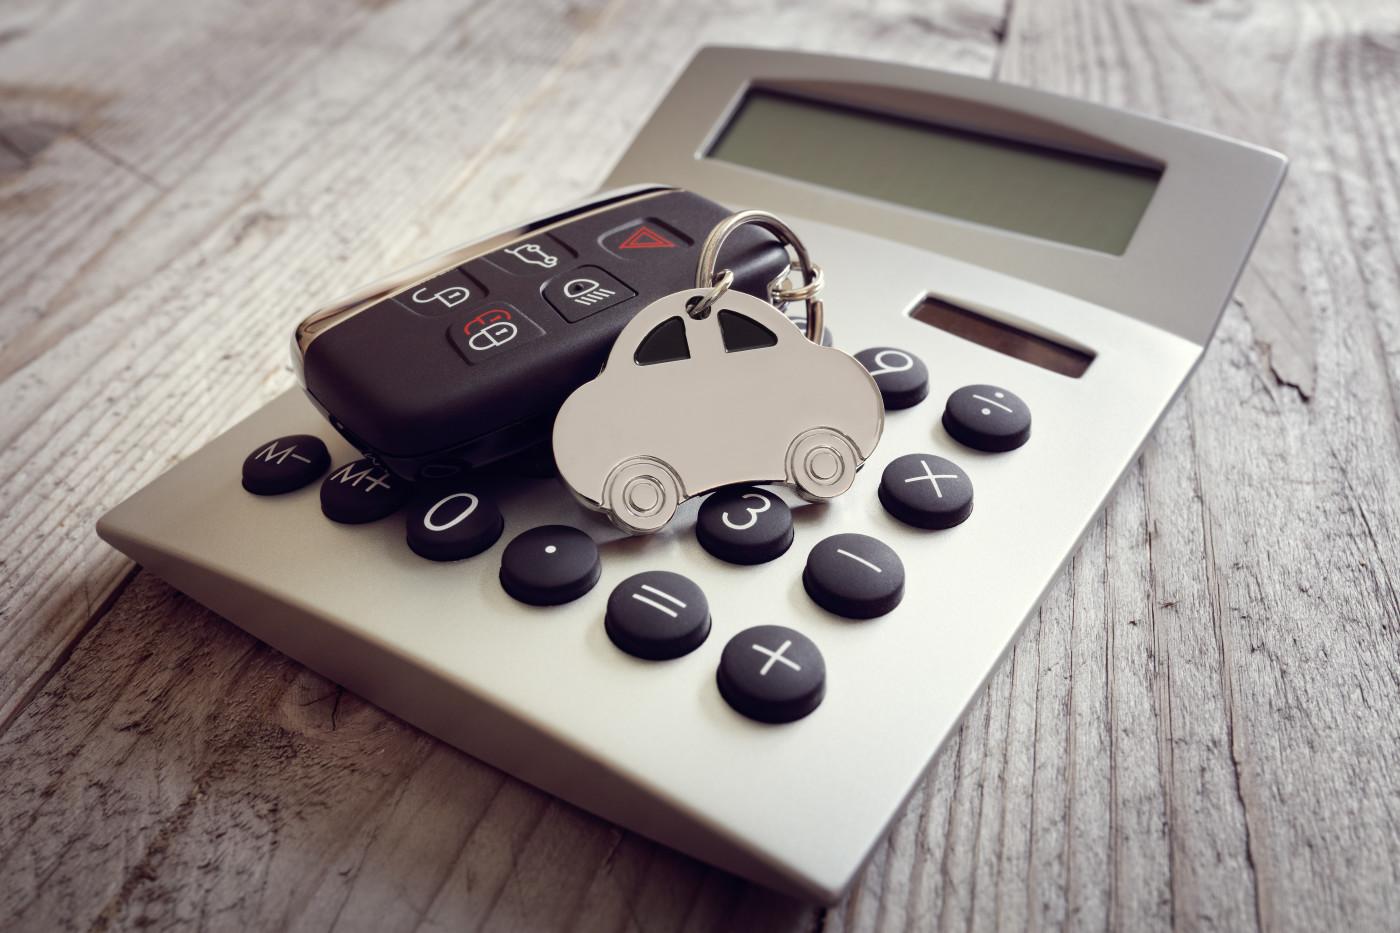 car keys on a calculator